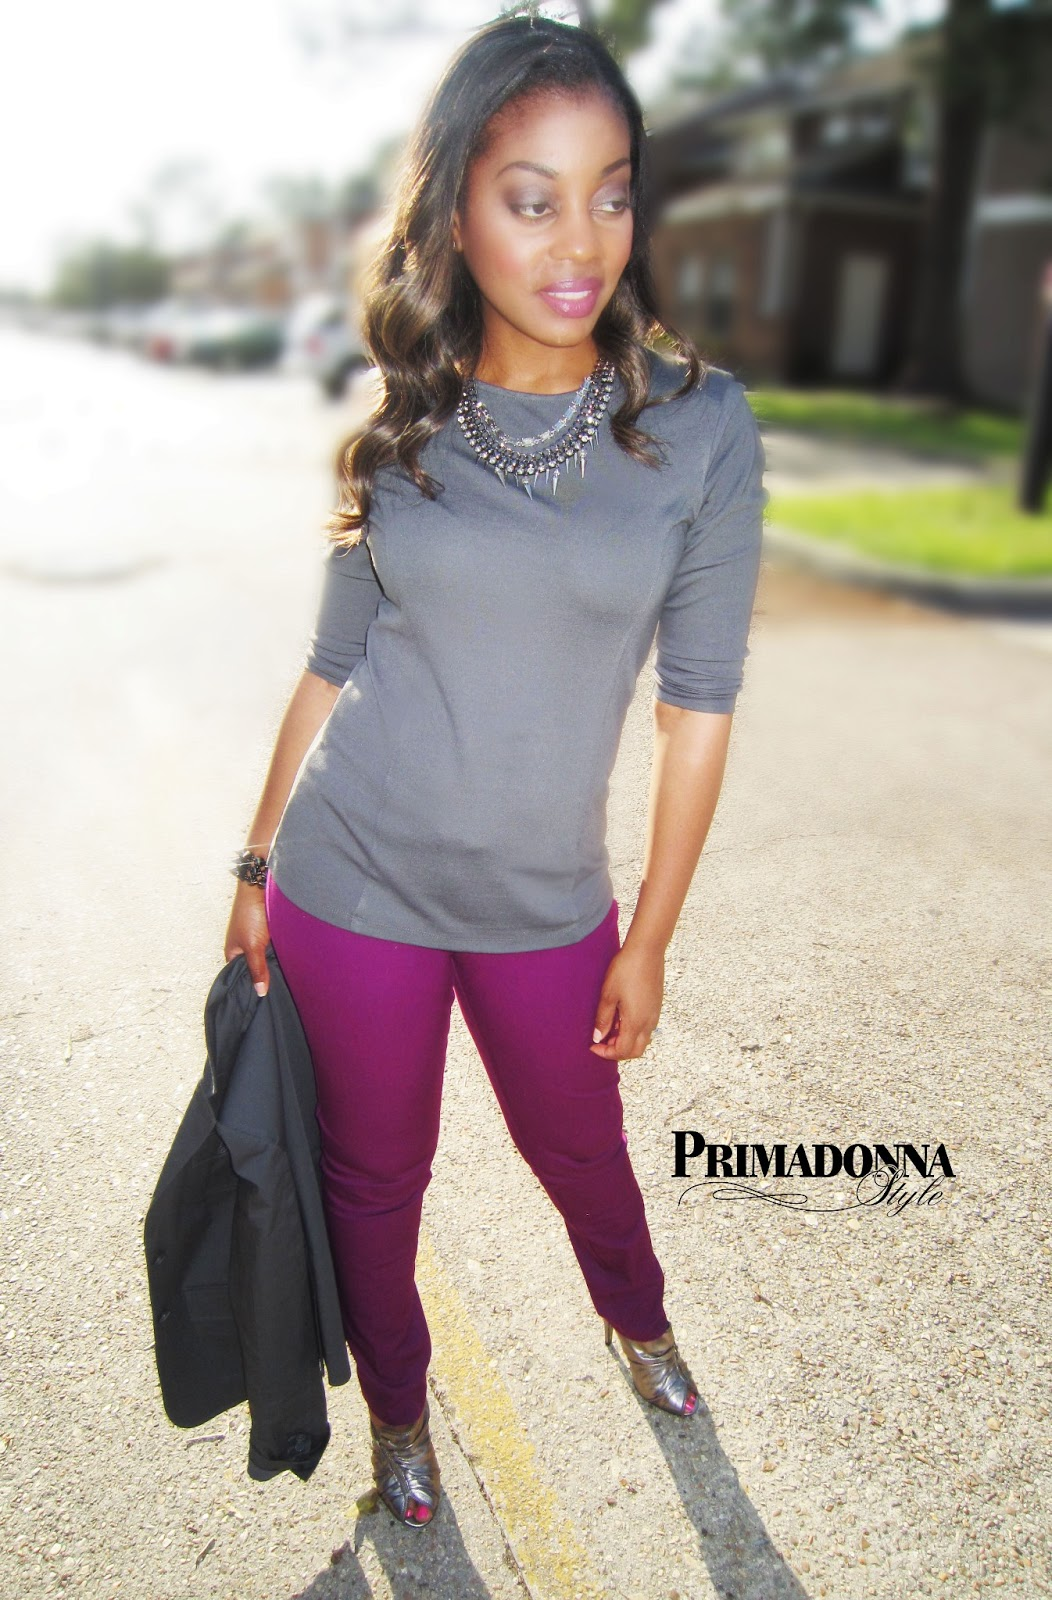 Primadonna Style: Work Week Chic: How to Wear Purple Pants